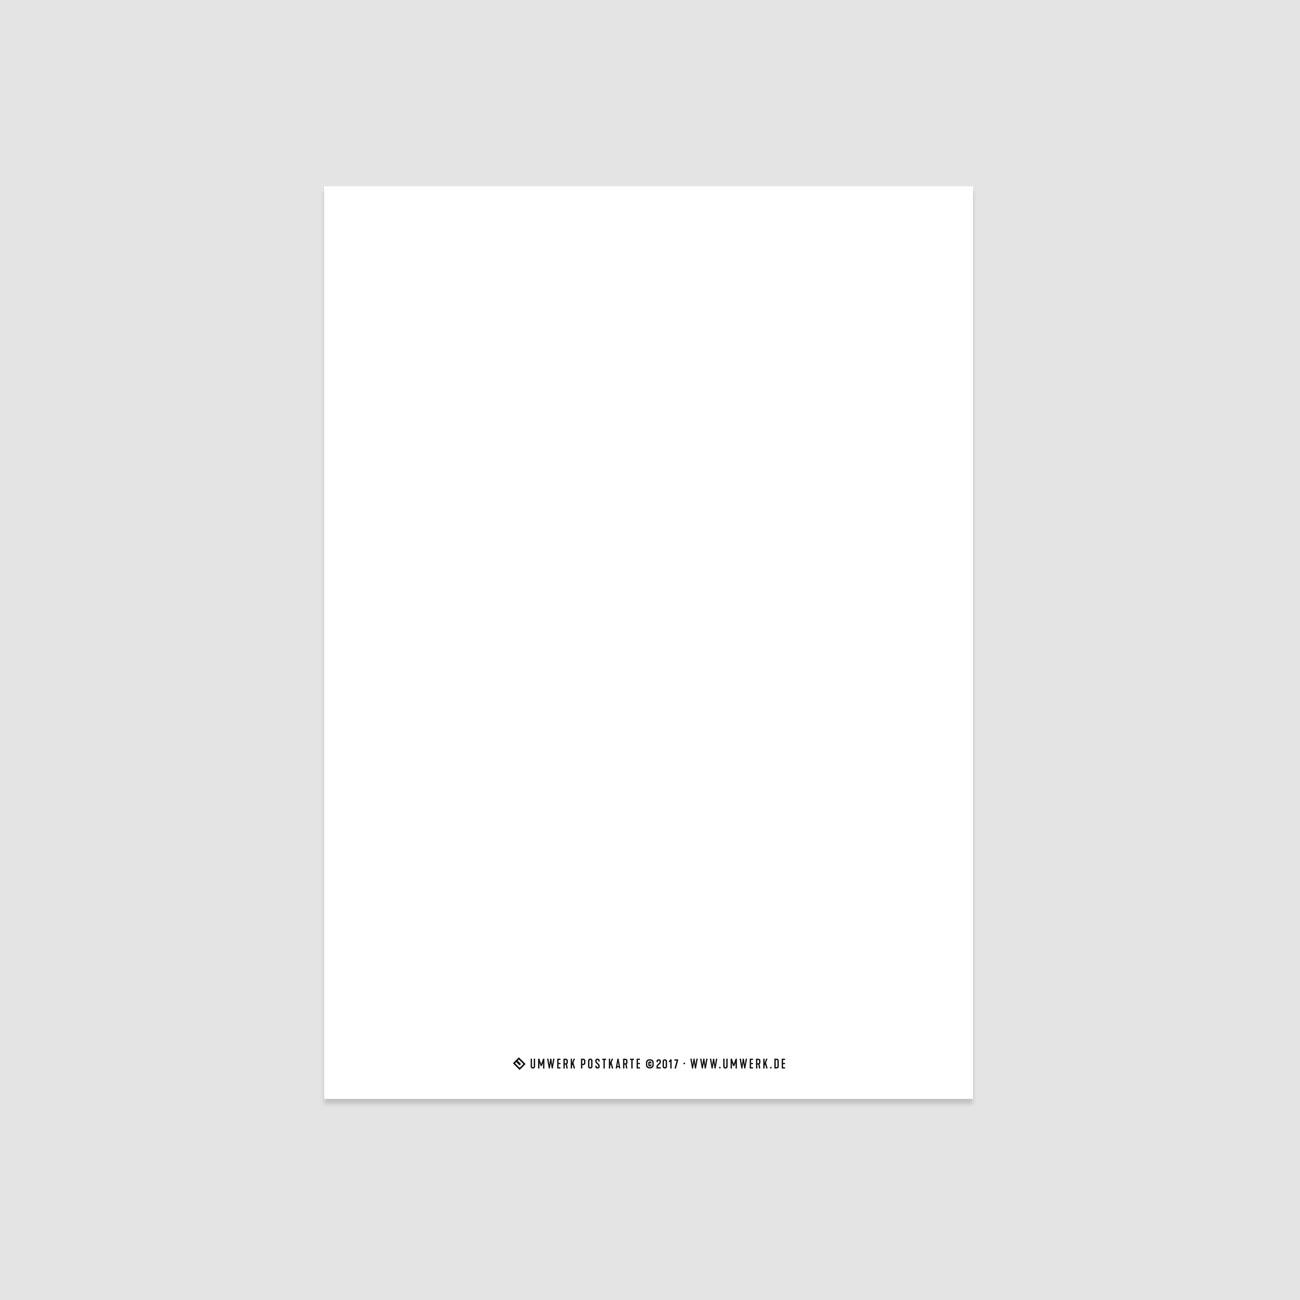 Postkarte, grafisch, sw, Rückseite, DIN-A6